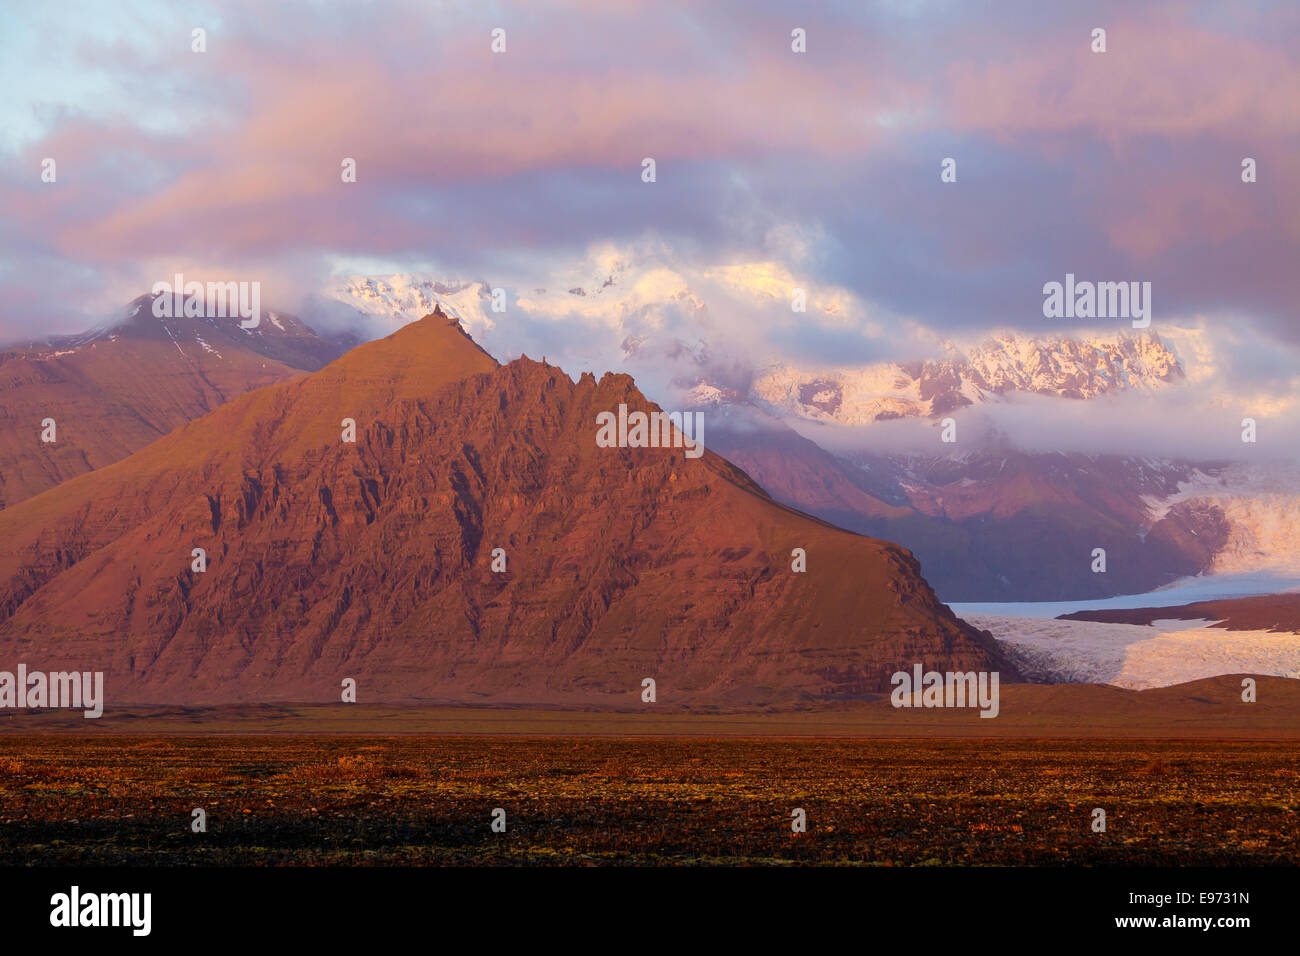 Vatnajokull National Park, Iceland - Stock Image